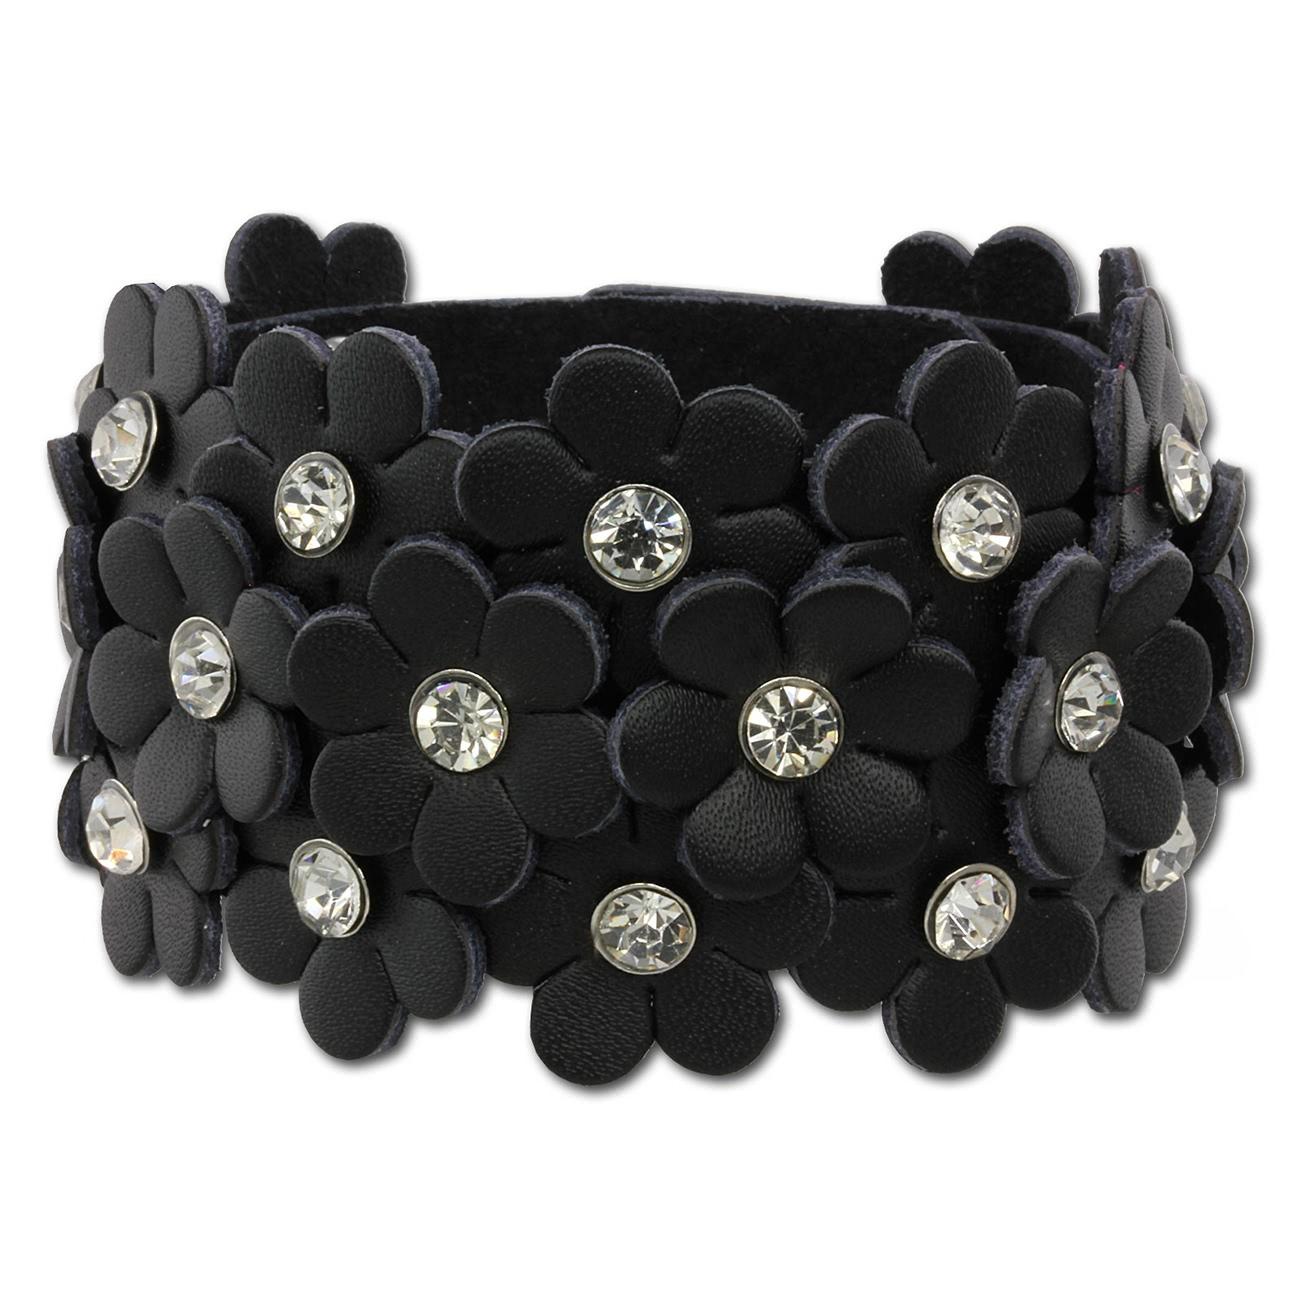 Lederarmband damen schwarz  SilberDream Lederarmband schwarz Glitzer Blumen Damen Armband ...